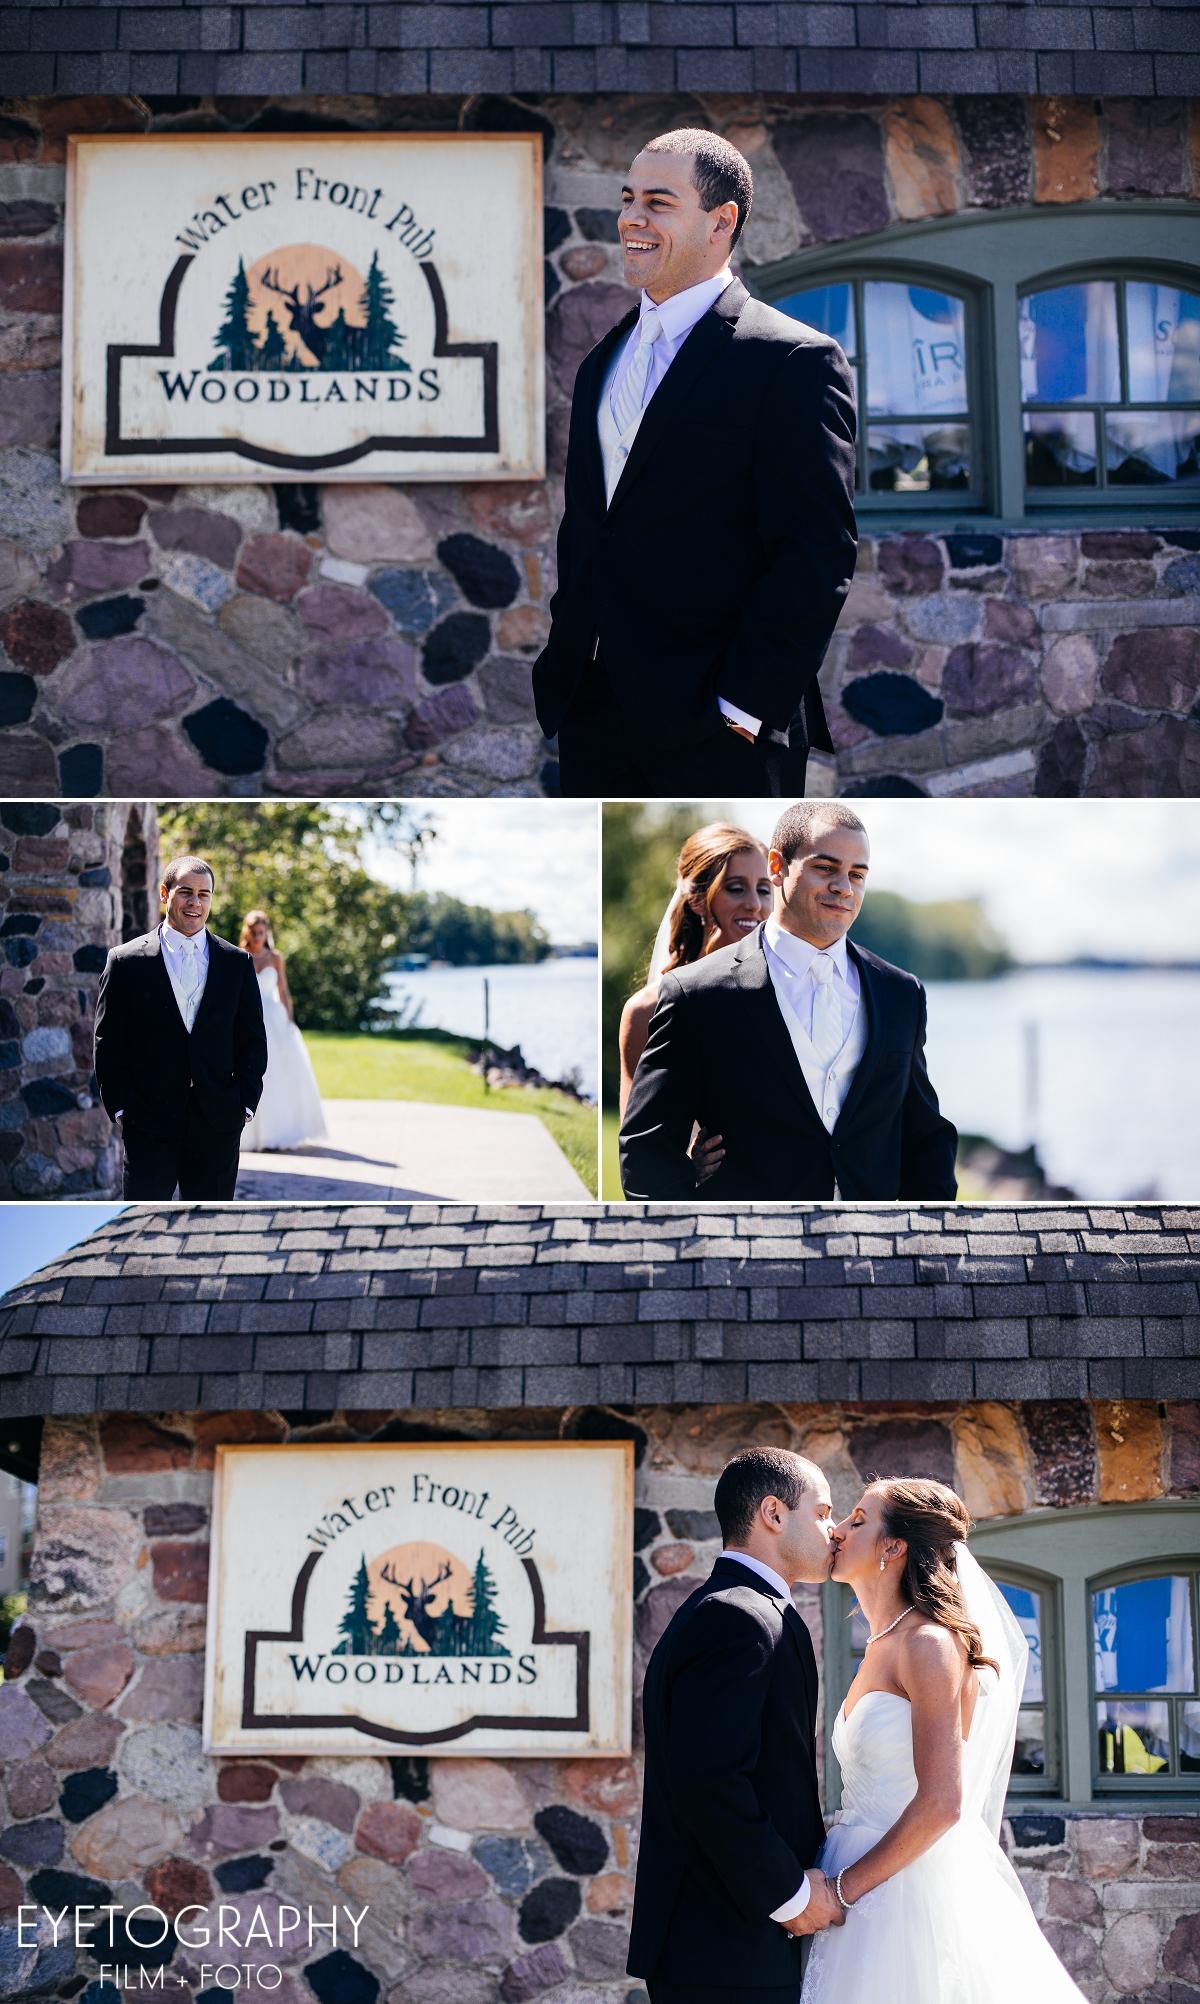 Birchwood Wisconsin Wedding Photography - Chris + Jenni - Eyetography Film + Foto 5